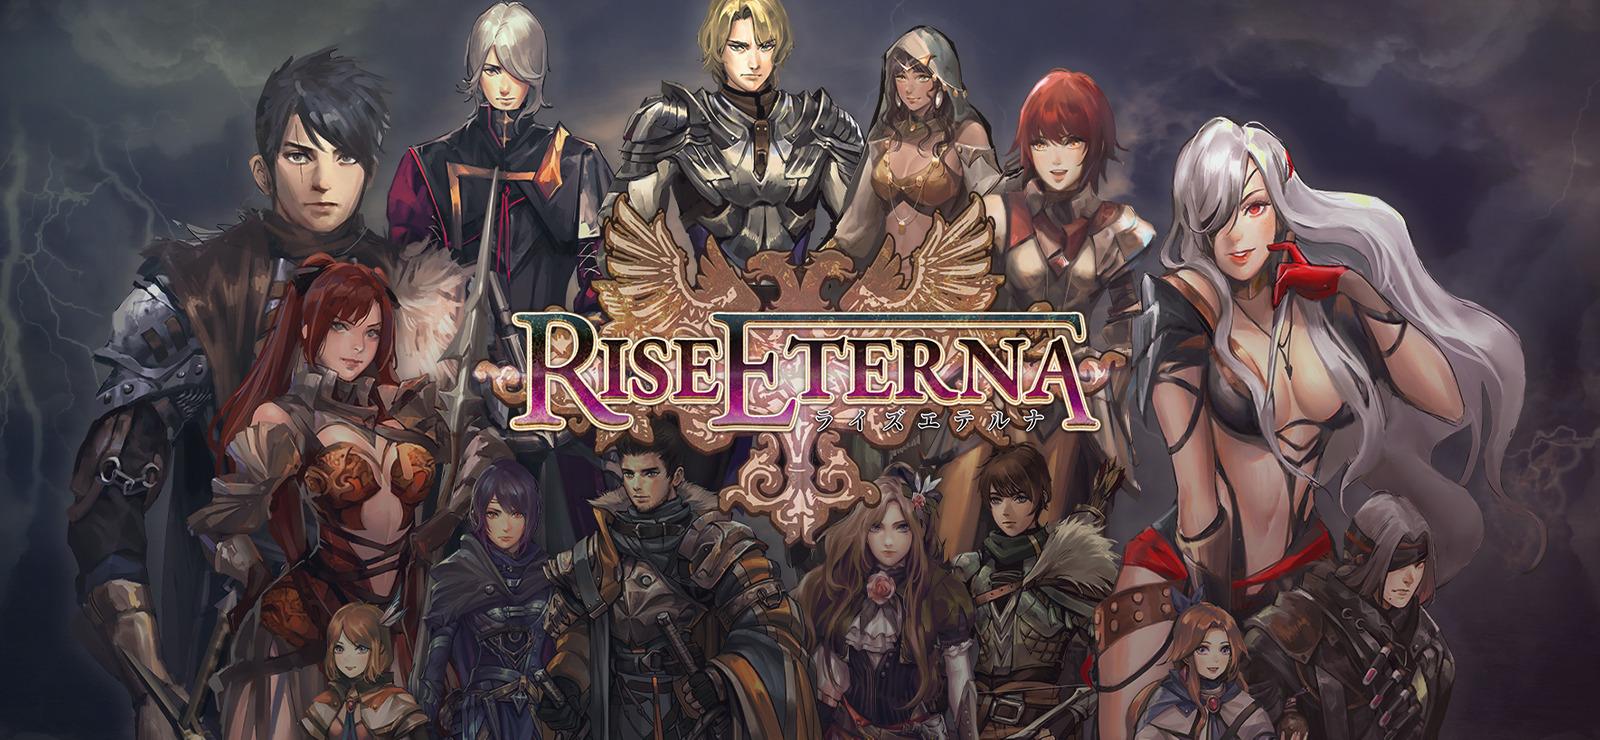 rise-eterna-pc-cover